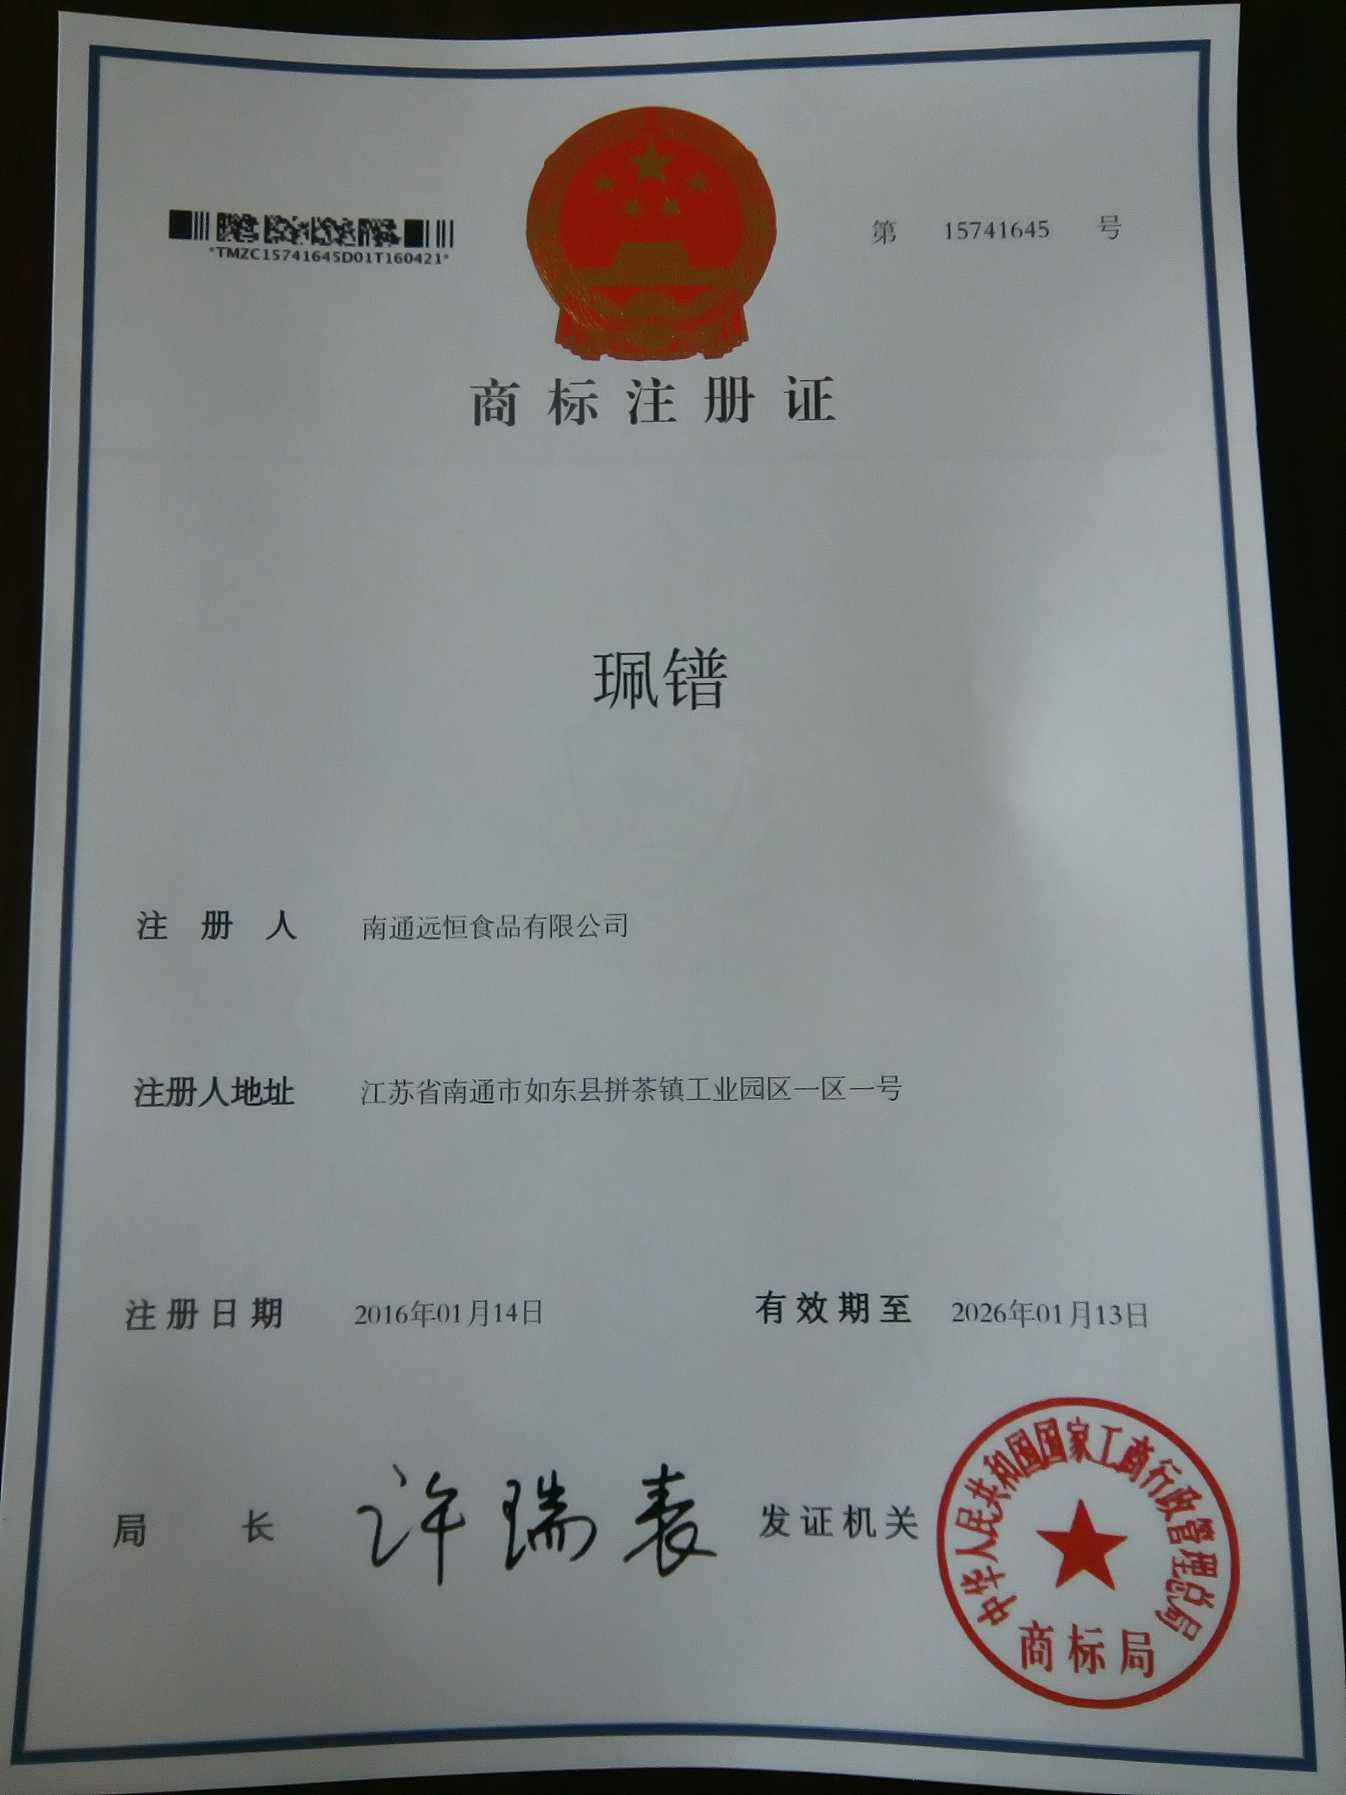 OEM brand certificate